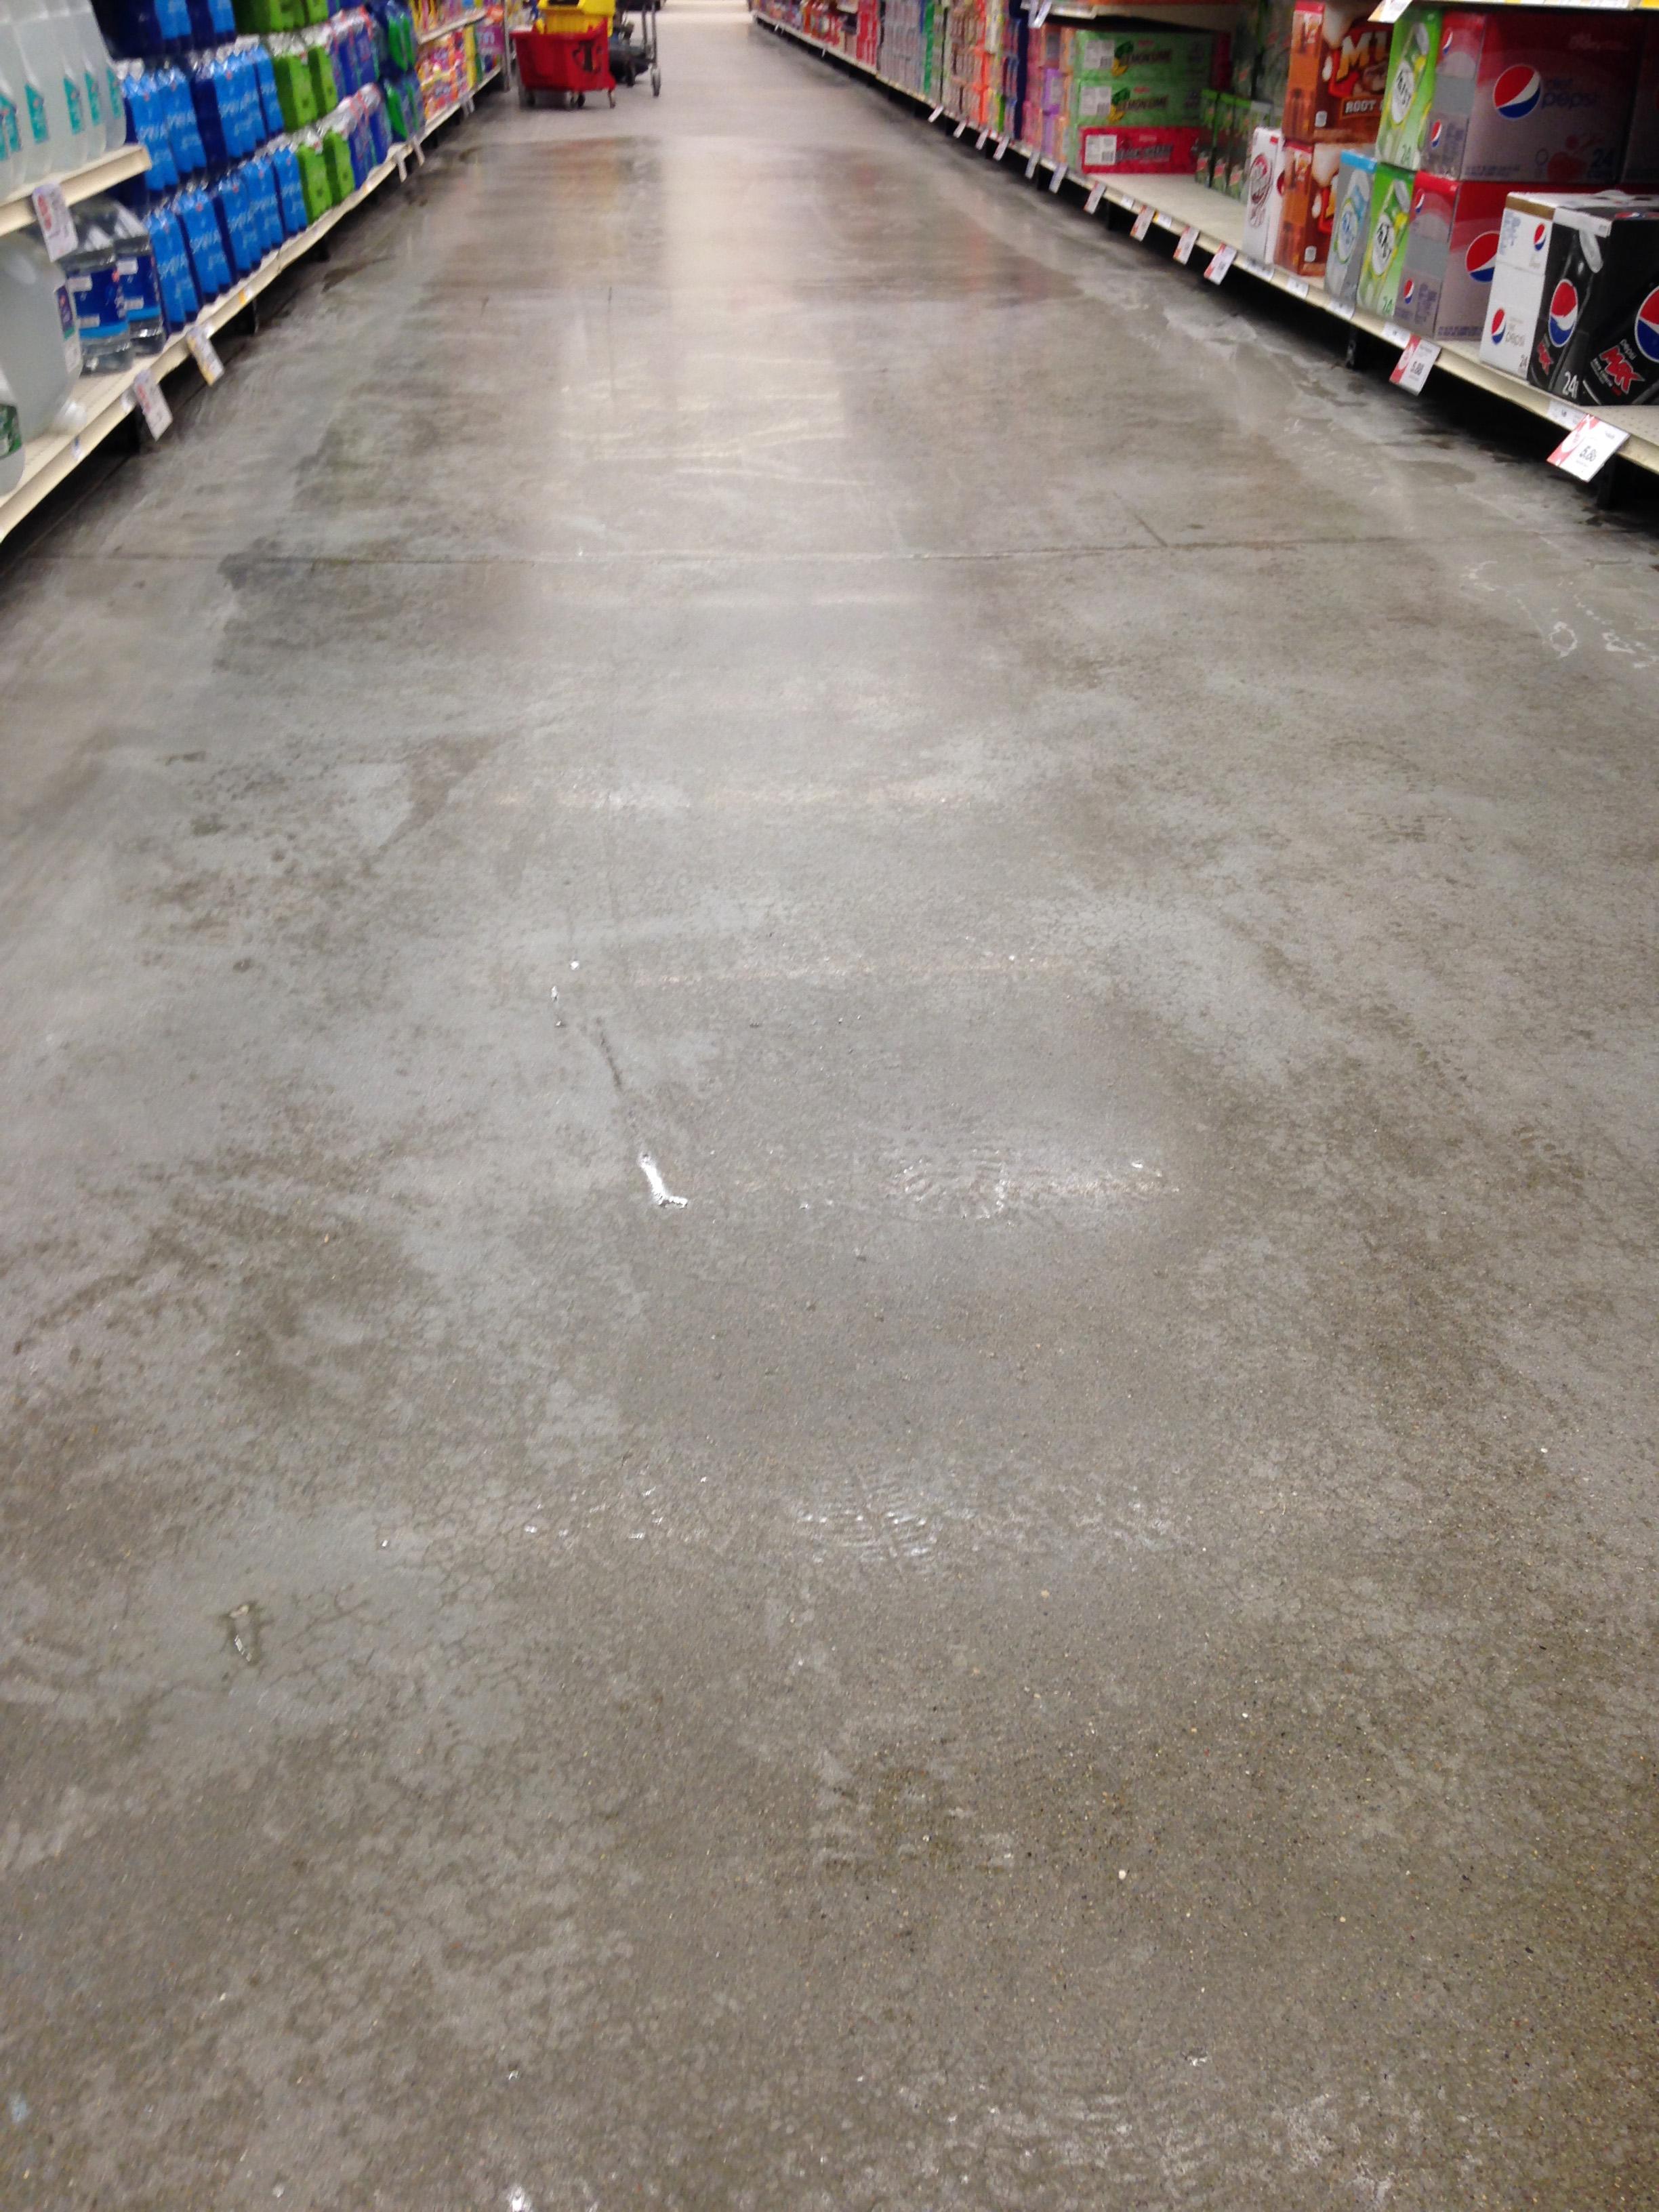 Grocery Store Floors Before